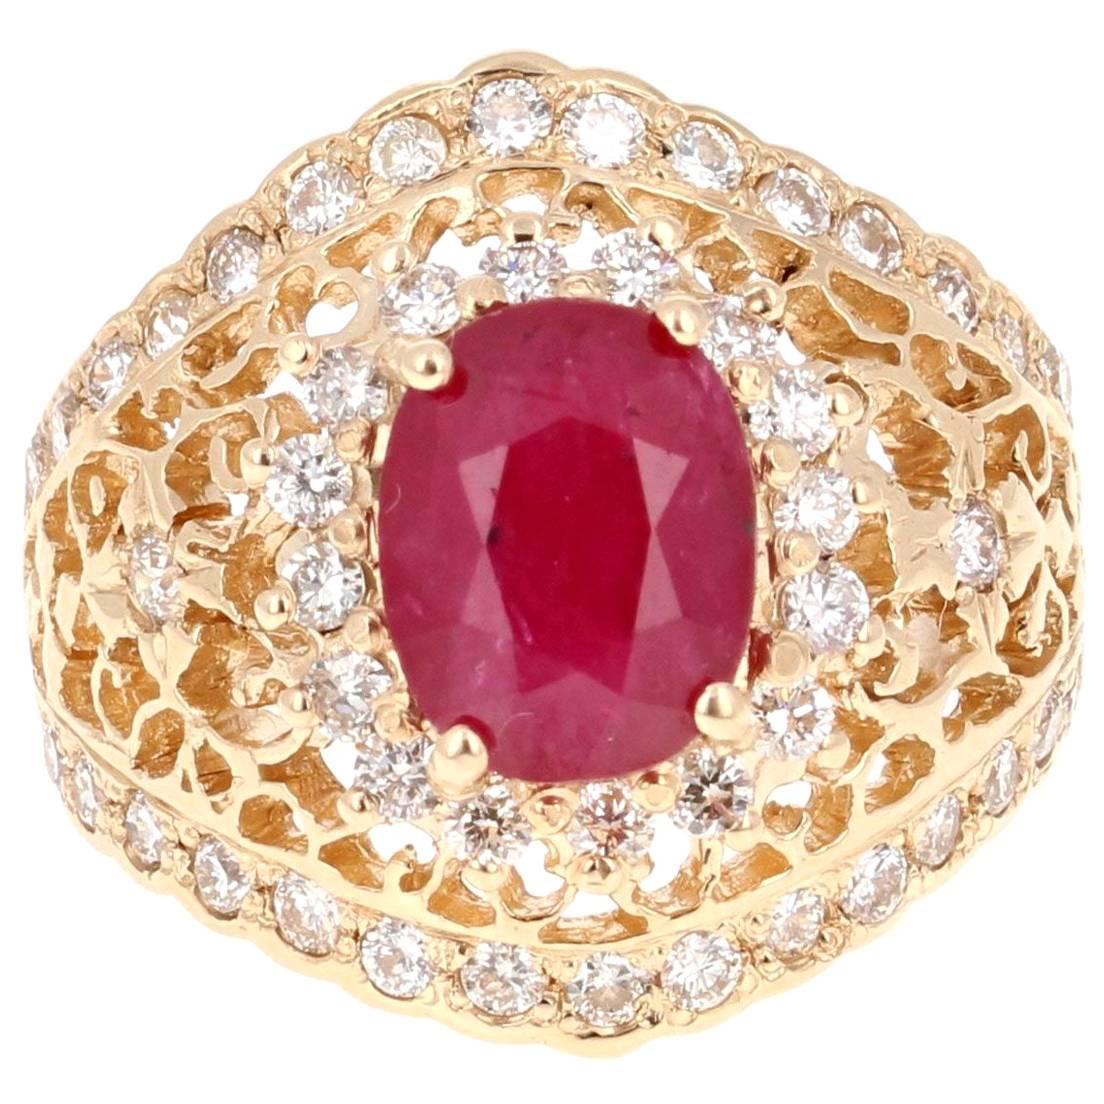 3.61 Carat Ruby Diamond Art Deco Style Yellow Gold Ring